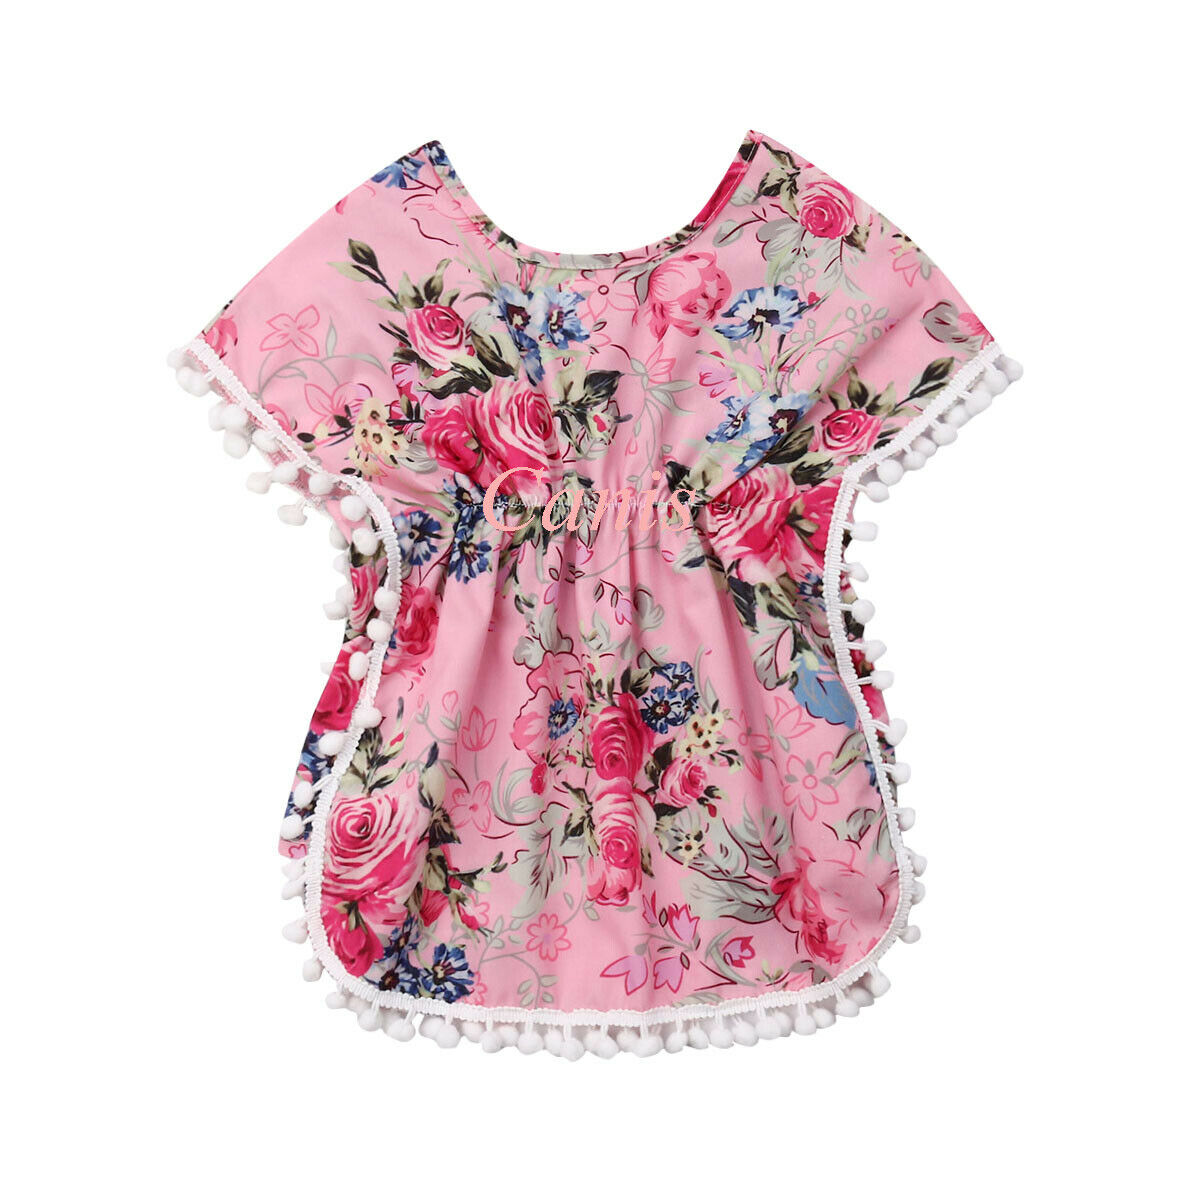 2-7y Sommer Kleinkind Kinder Baby Mädchen Quaste Ball Floral Boho T-shirt T Tops Outfits Bademode Kleidung Angenehme SüßE